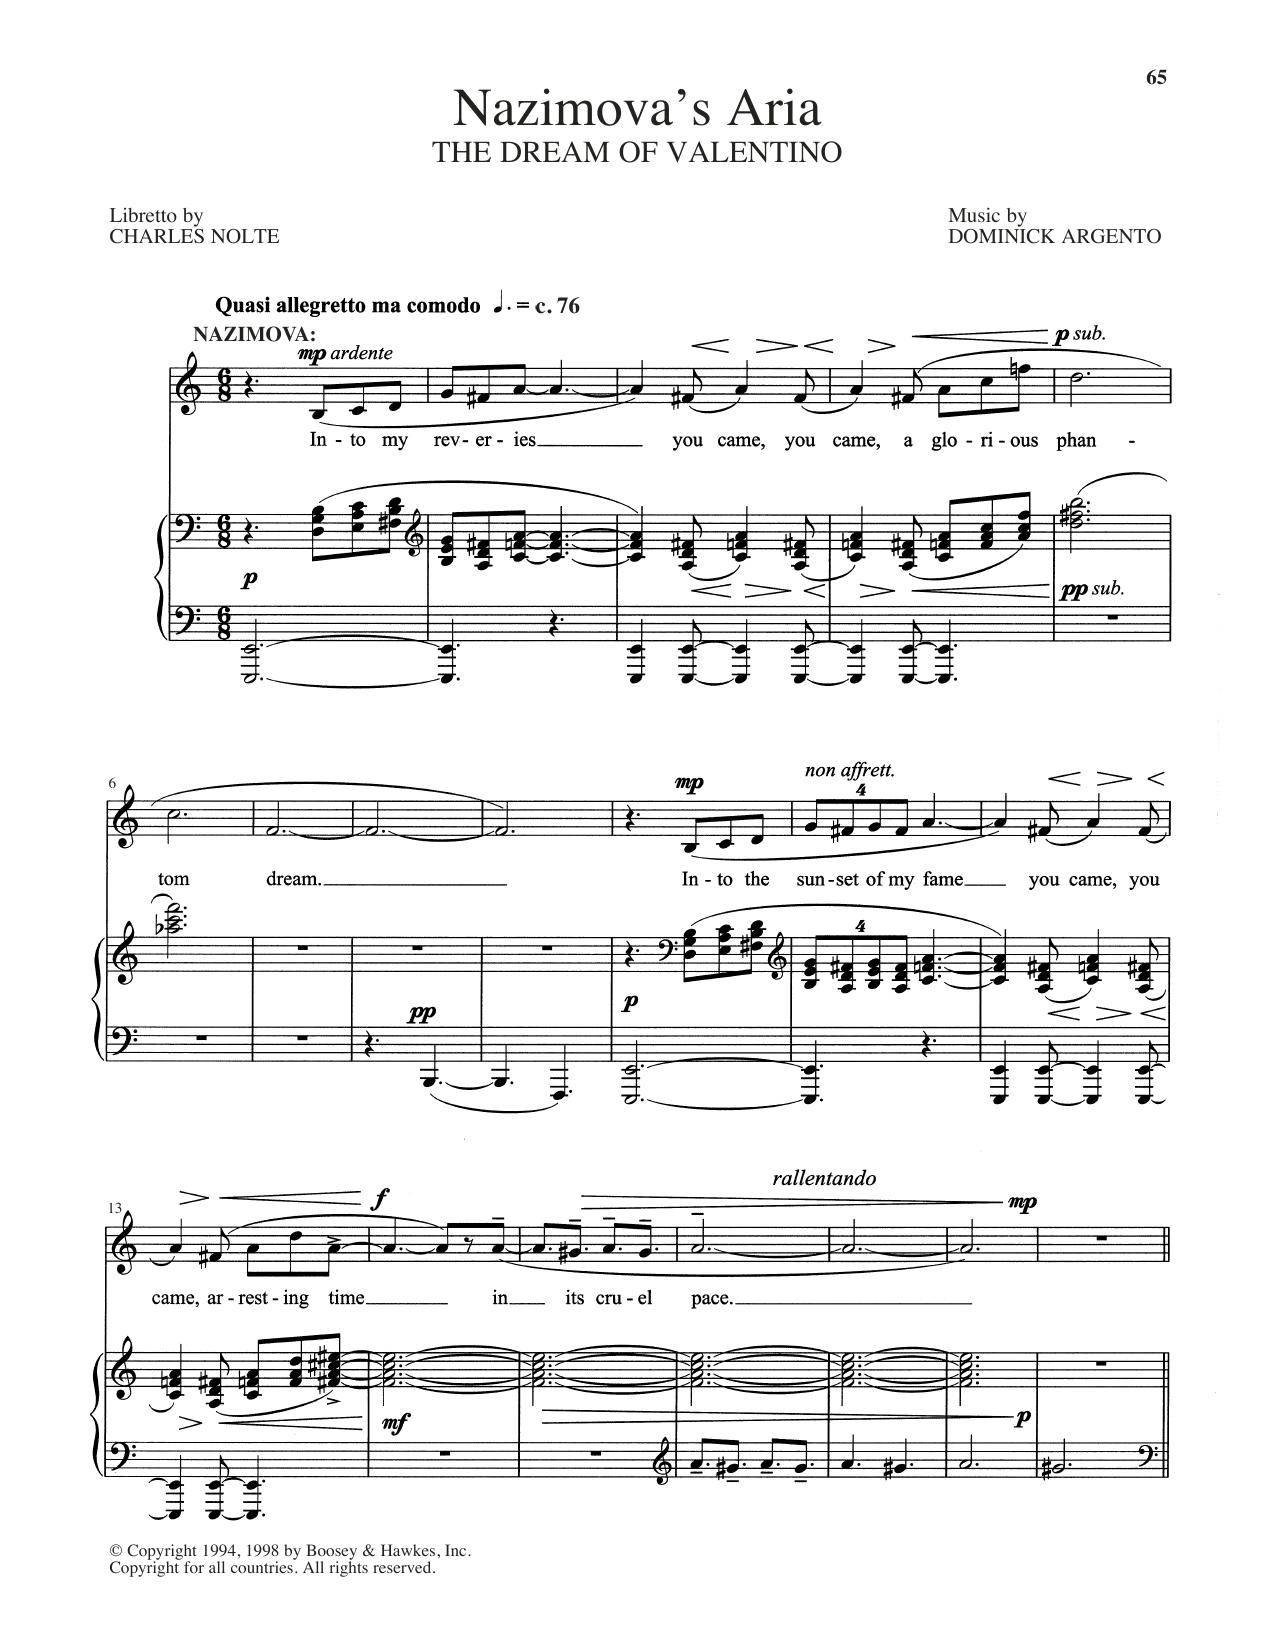 Dominick Argento 'Nazimova's Aria' Sheet Music Notes, Chords | Download  Printable Piano & Vocal - SKU: 404297